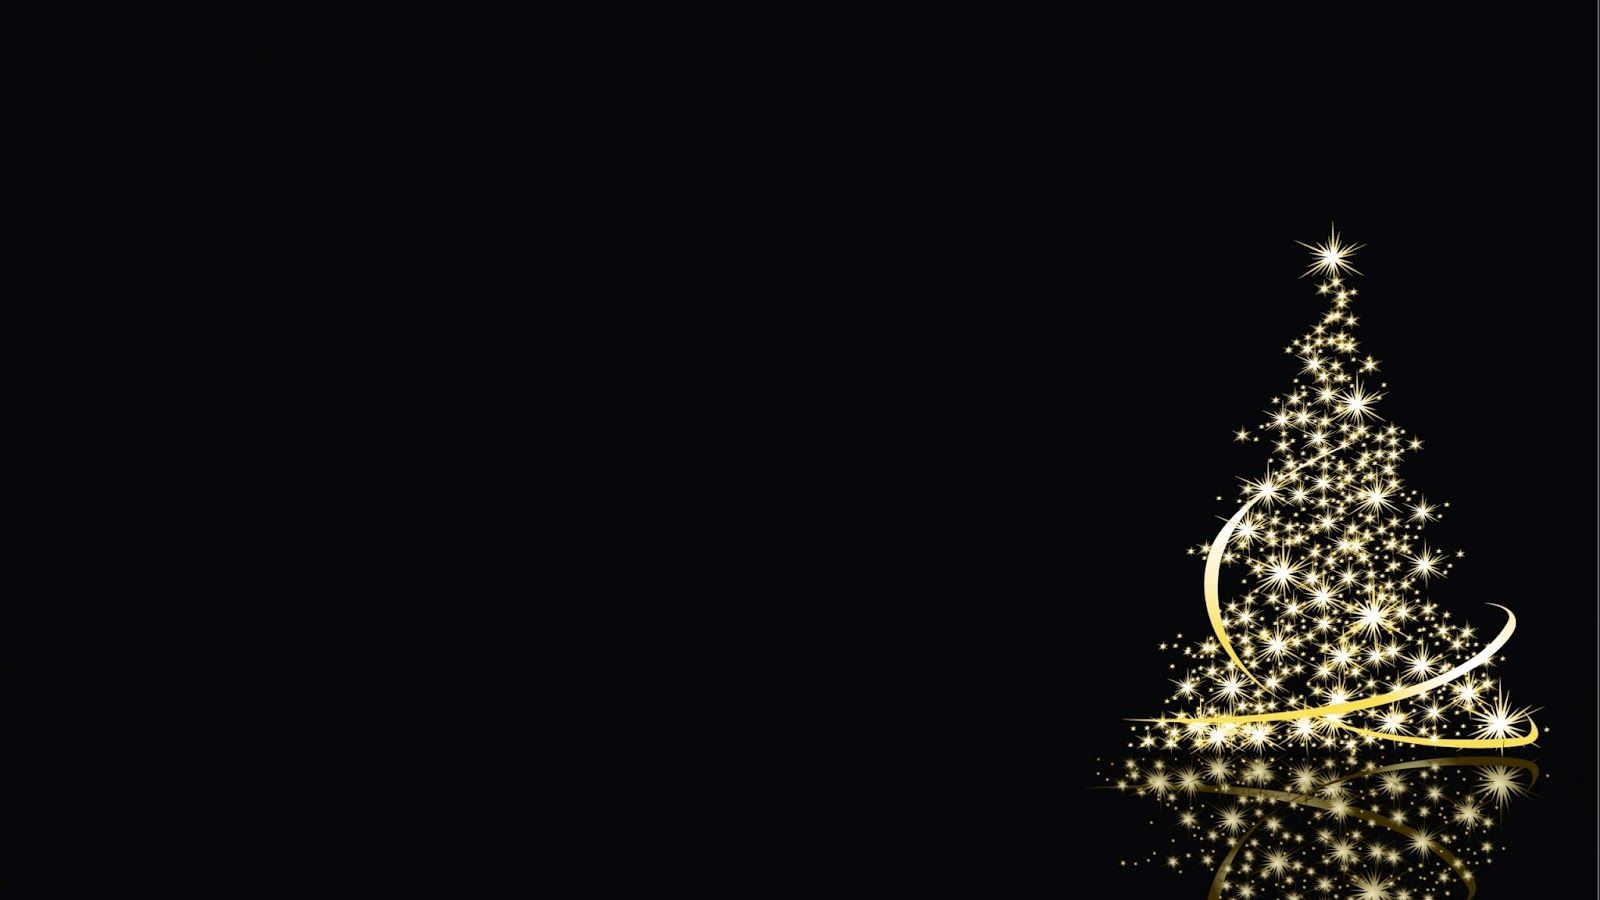 Tree Hd Wallpaper Macbook 2015 Christmas Design